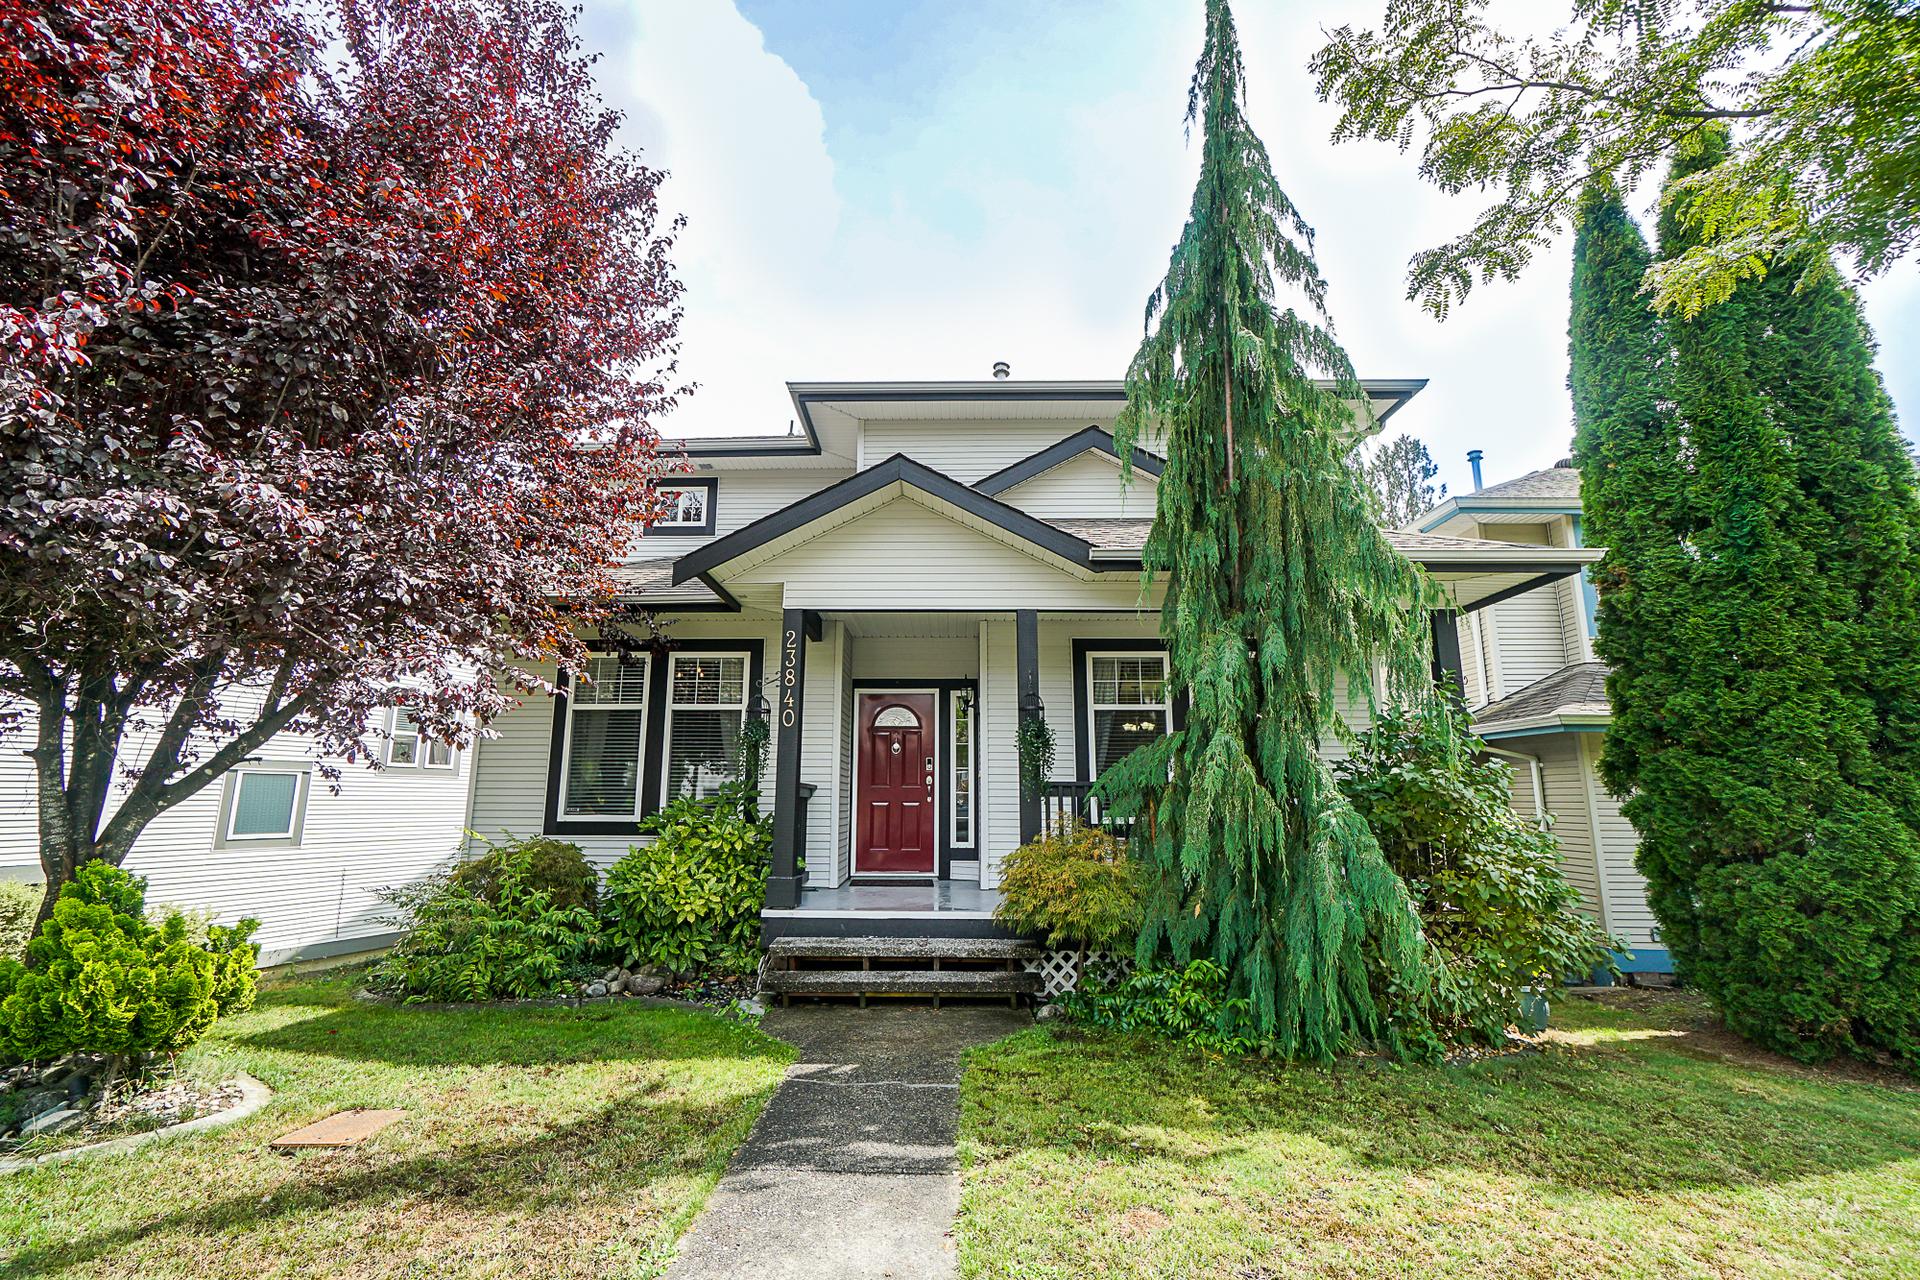 23840 Kanaka Way, Cottonwood MR, Maple Ridge